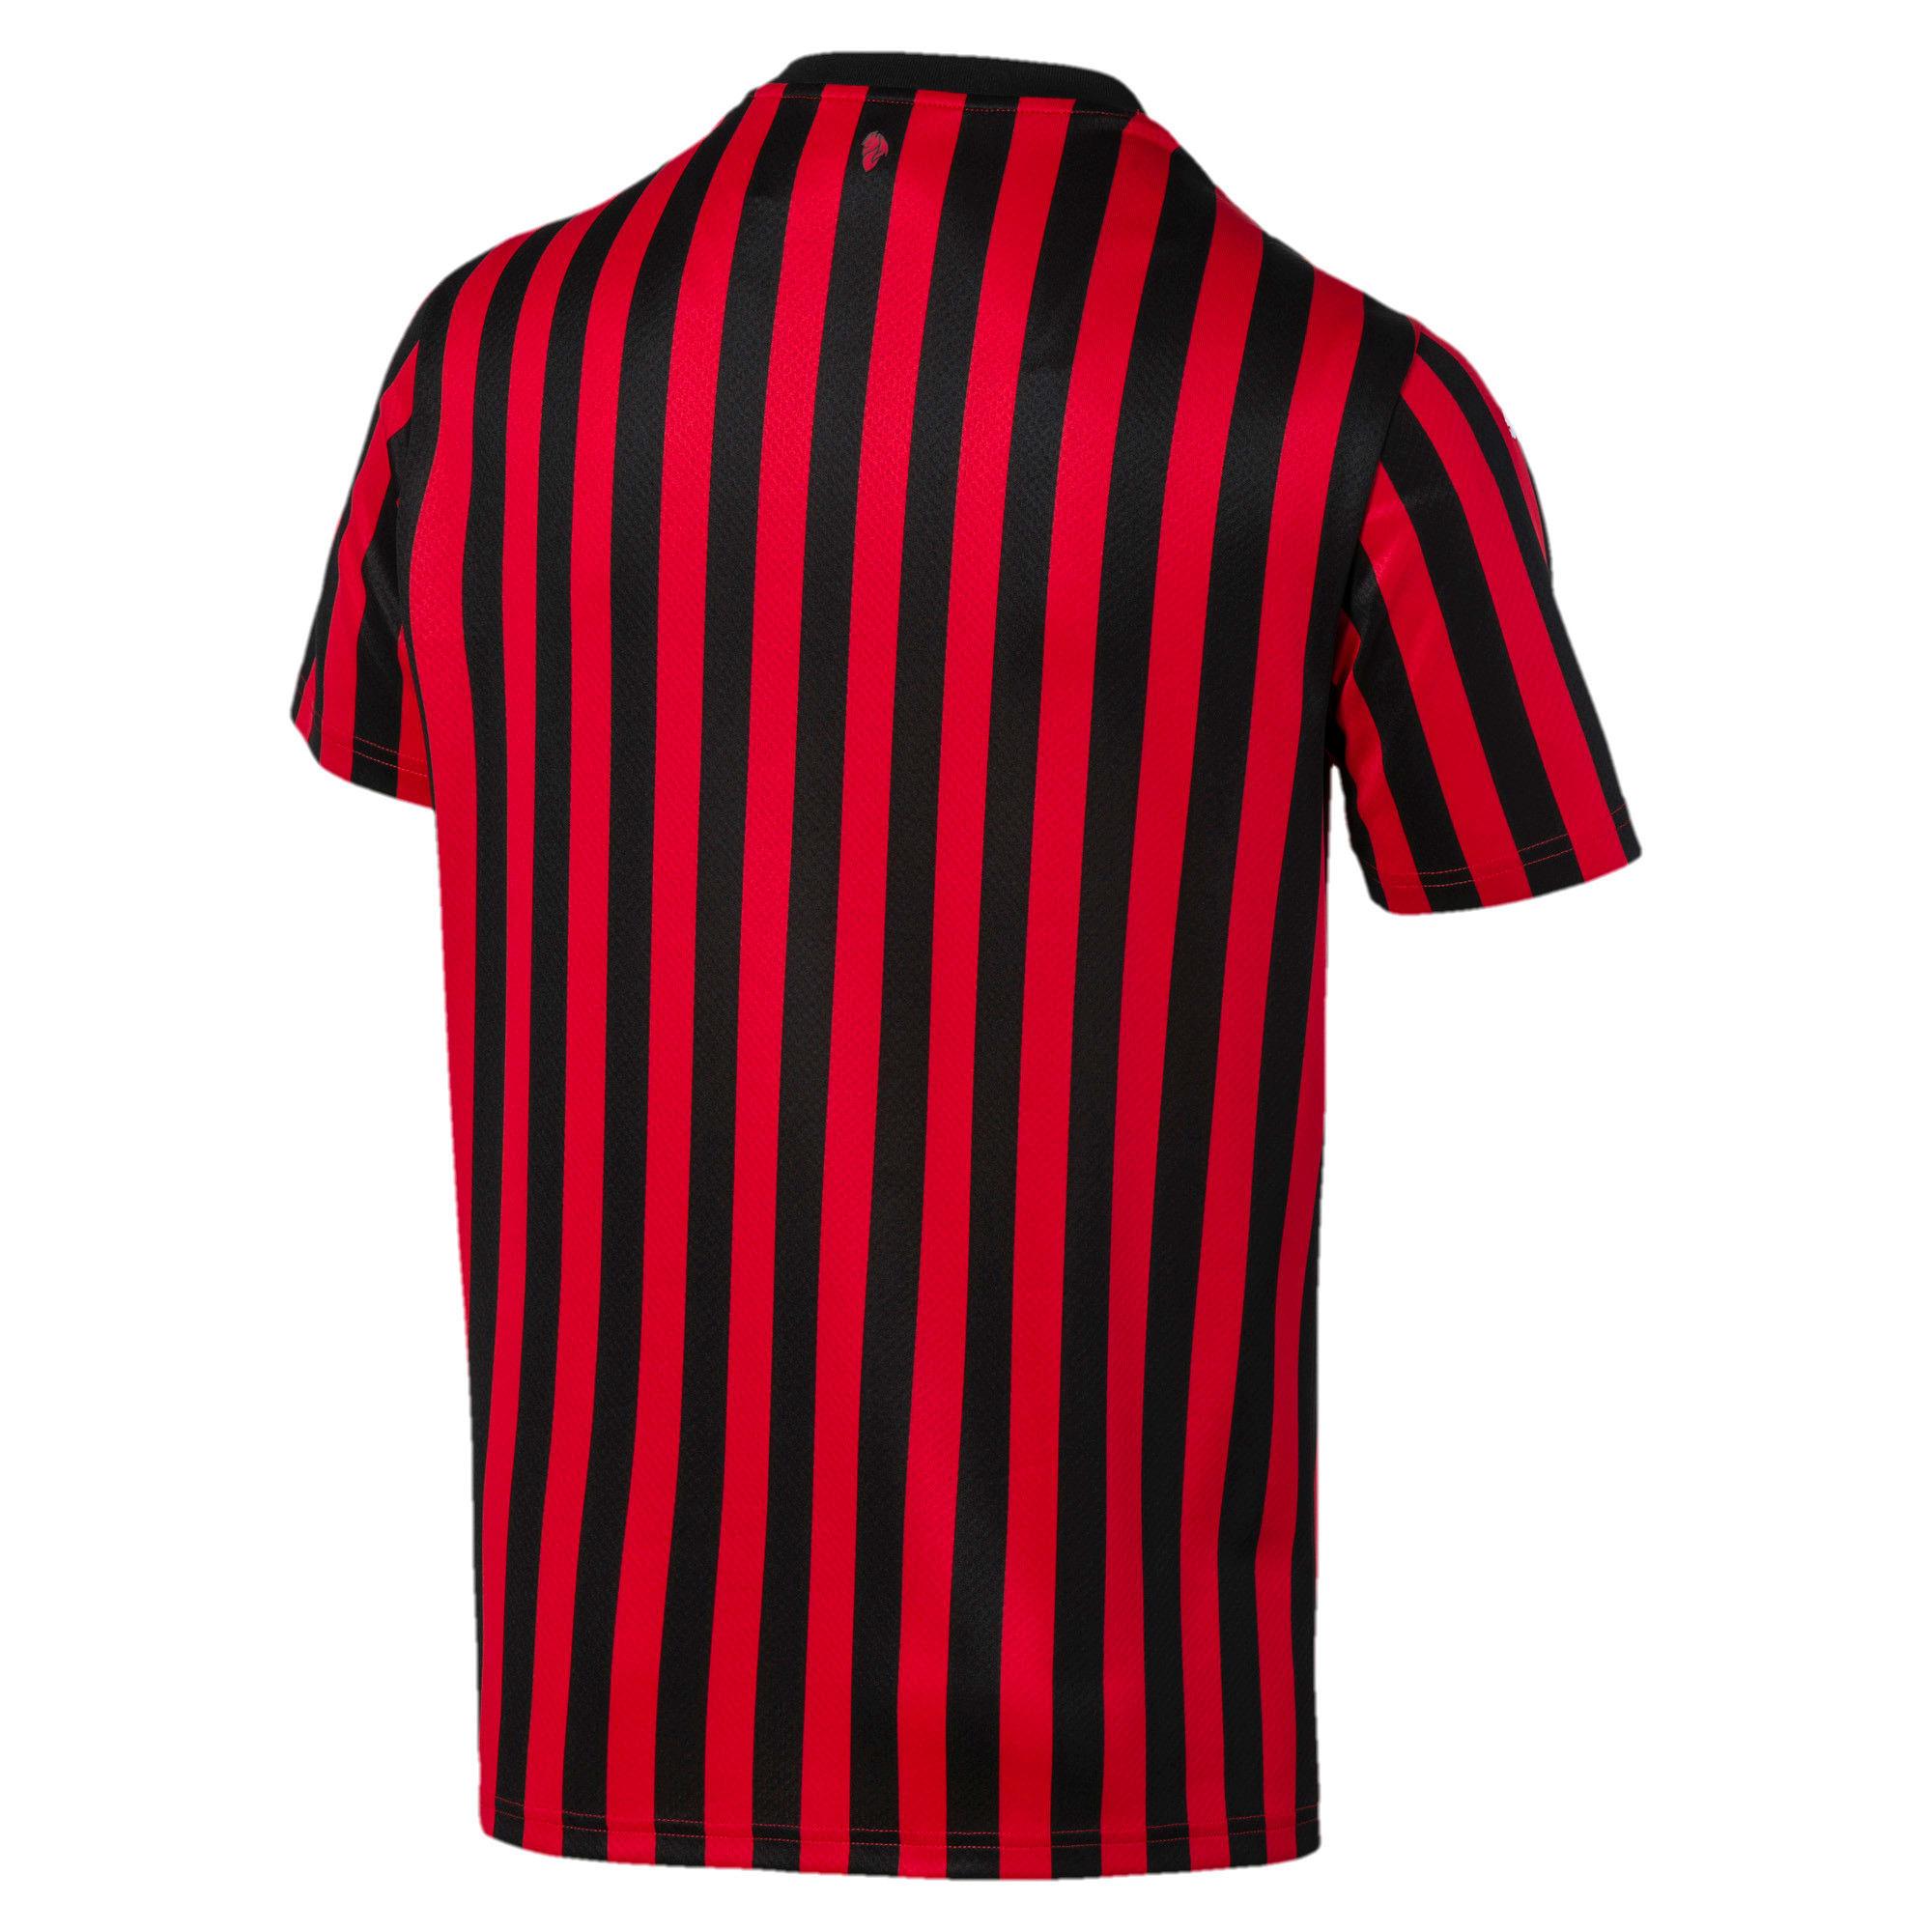 Thumbnail 5 of AC Milan Men's Home Replica Jersey, Tango Red -Puma Black, medium